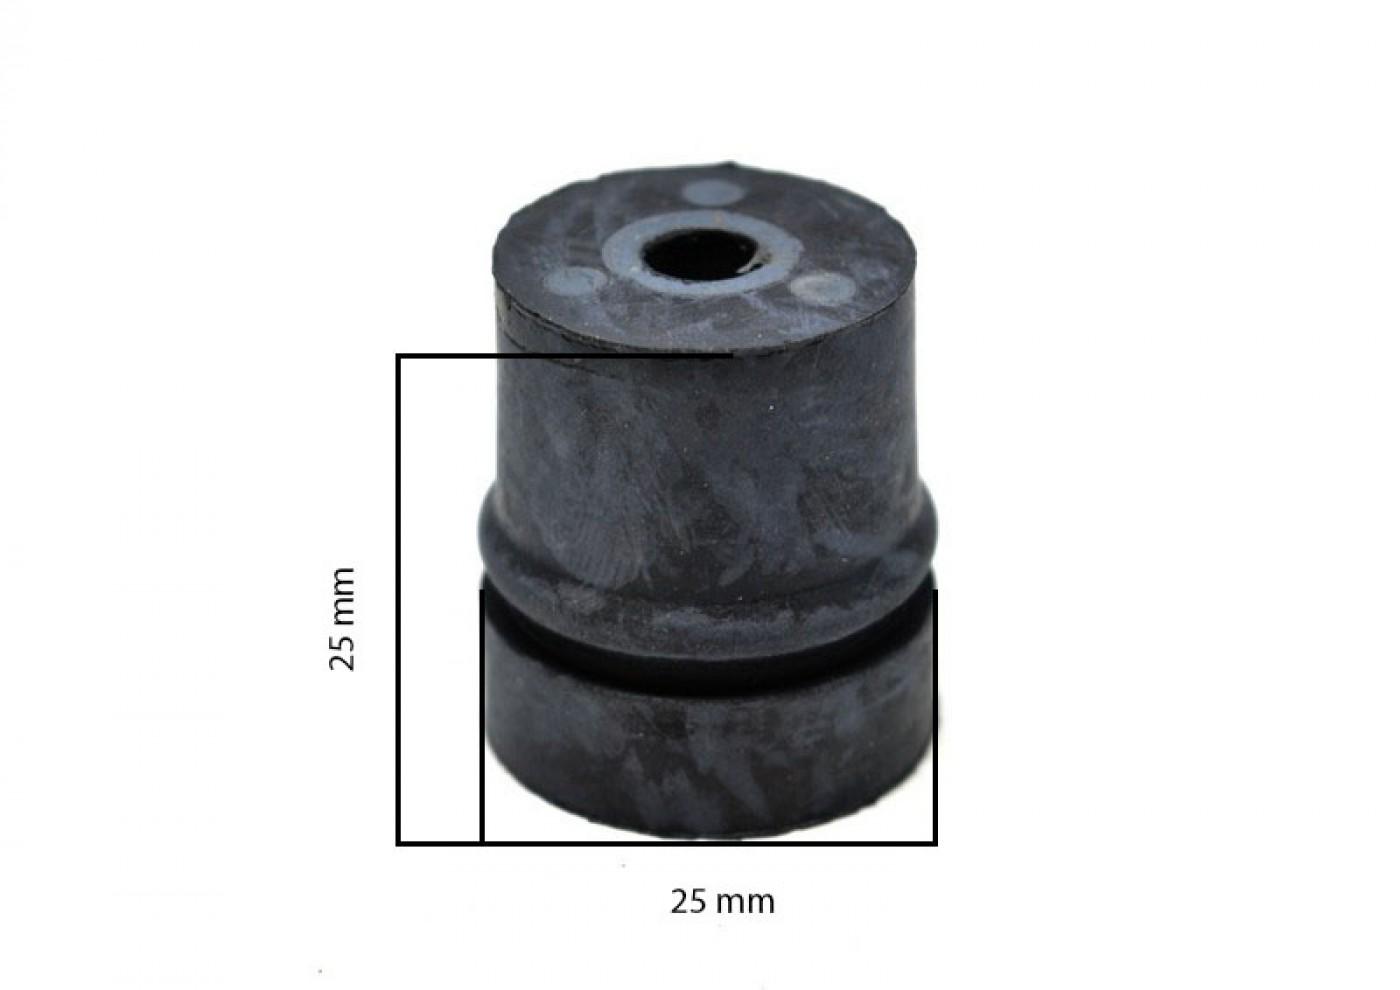 Silenblok 3 Stihl MS461